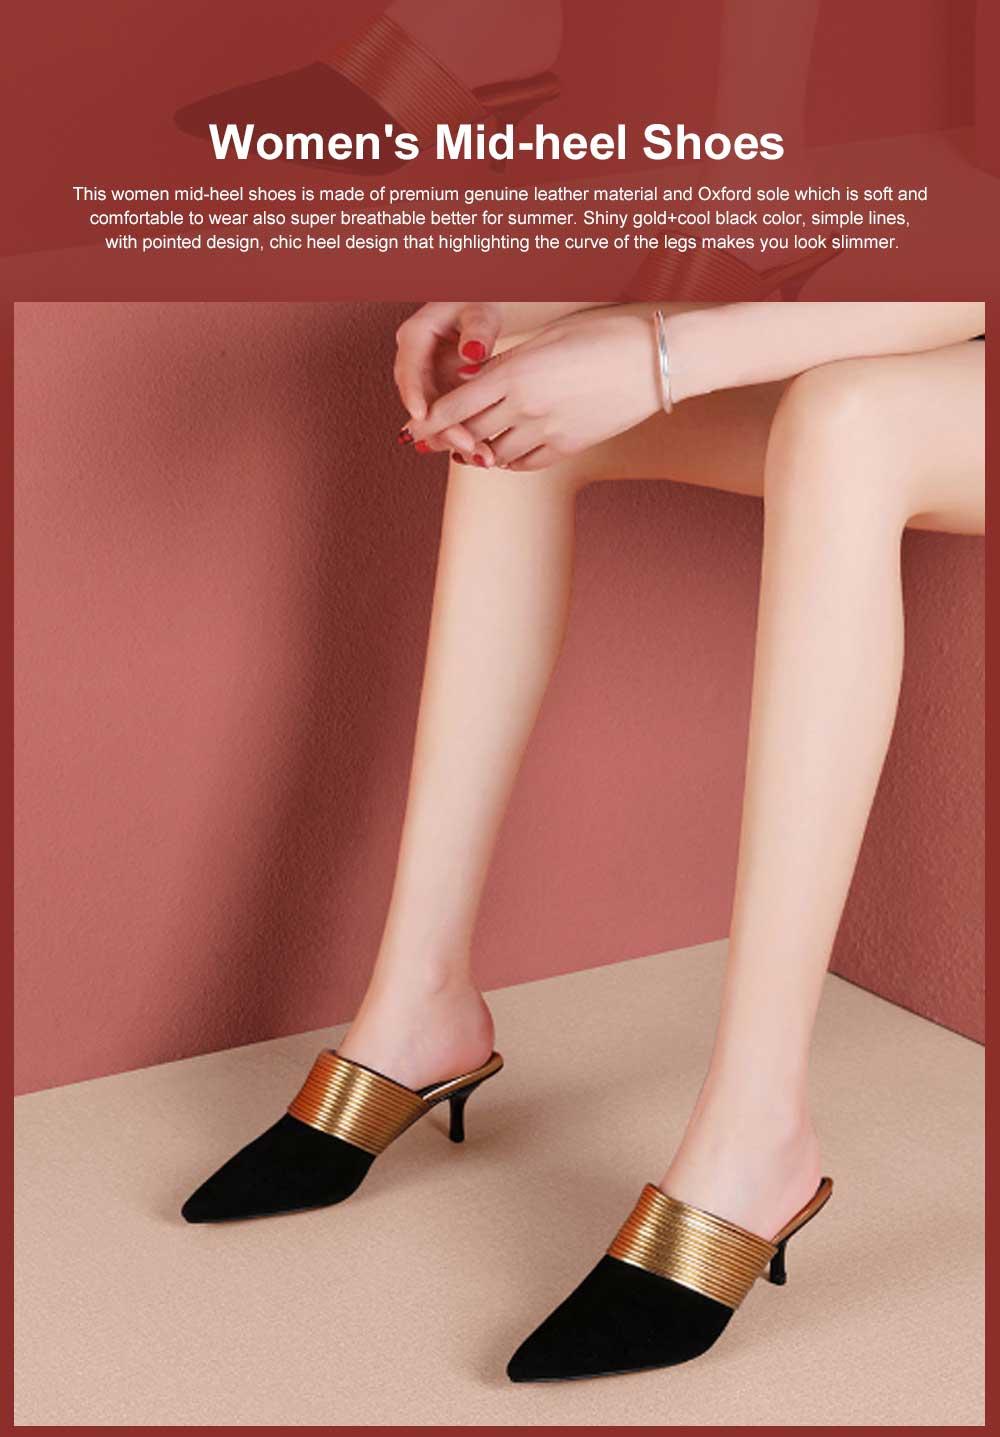 Women's Mid-heel Half Warped Shoes, Comfortable Pointed Toe Casual Shoe, Fashion Pure Color Slim Heel Stiletto Heels 0